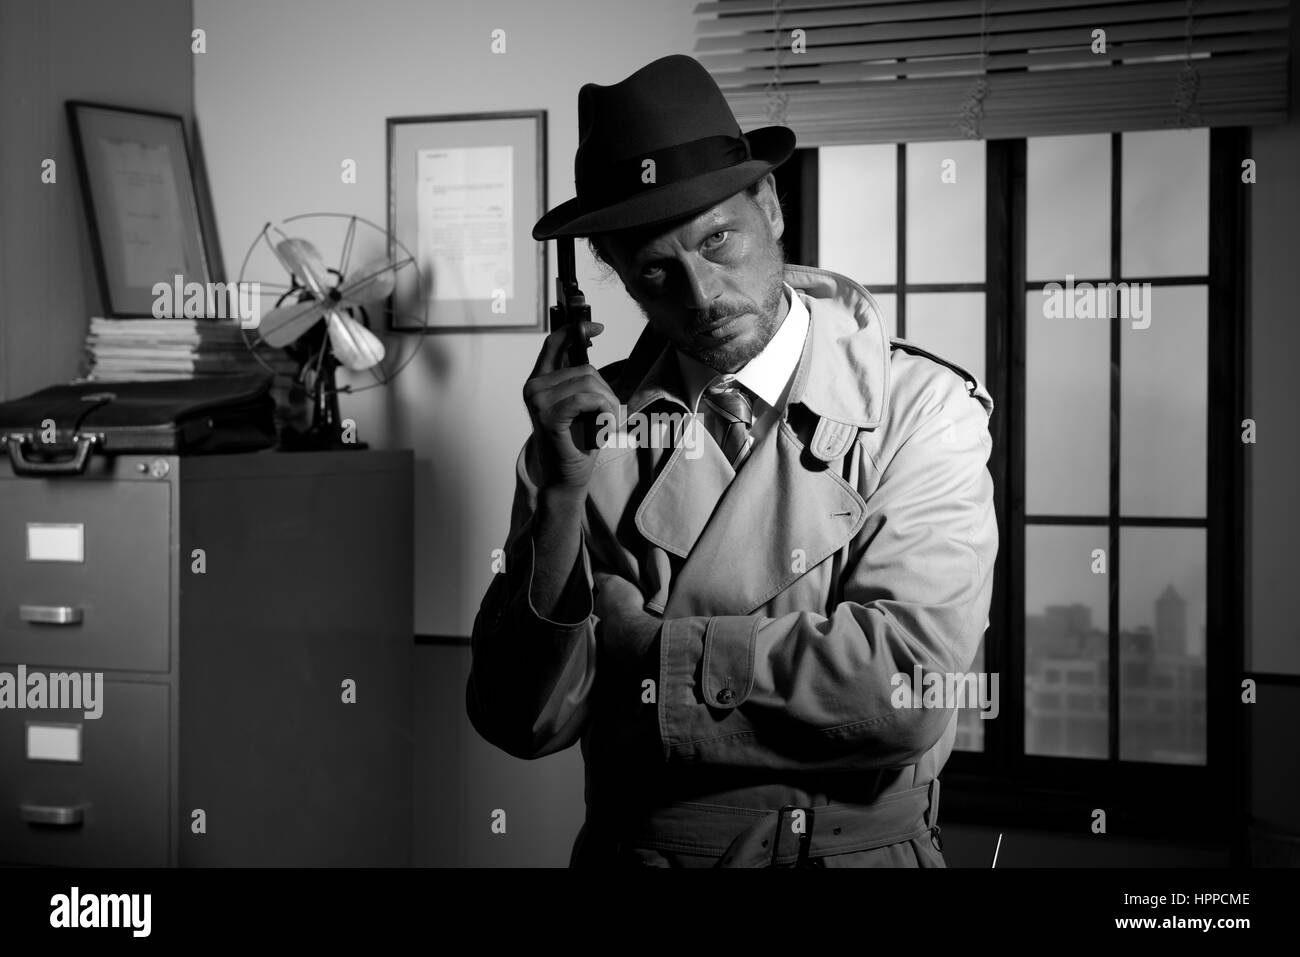 Ufficio Retro Wanita : White fedora gangster immagini & white fedora gangster fotos stock